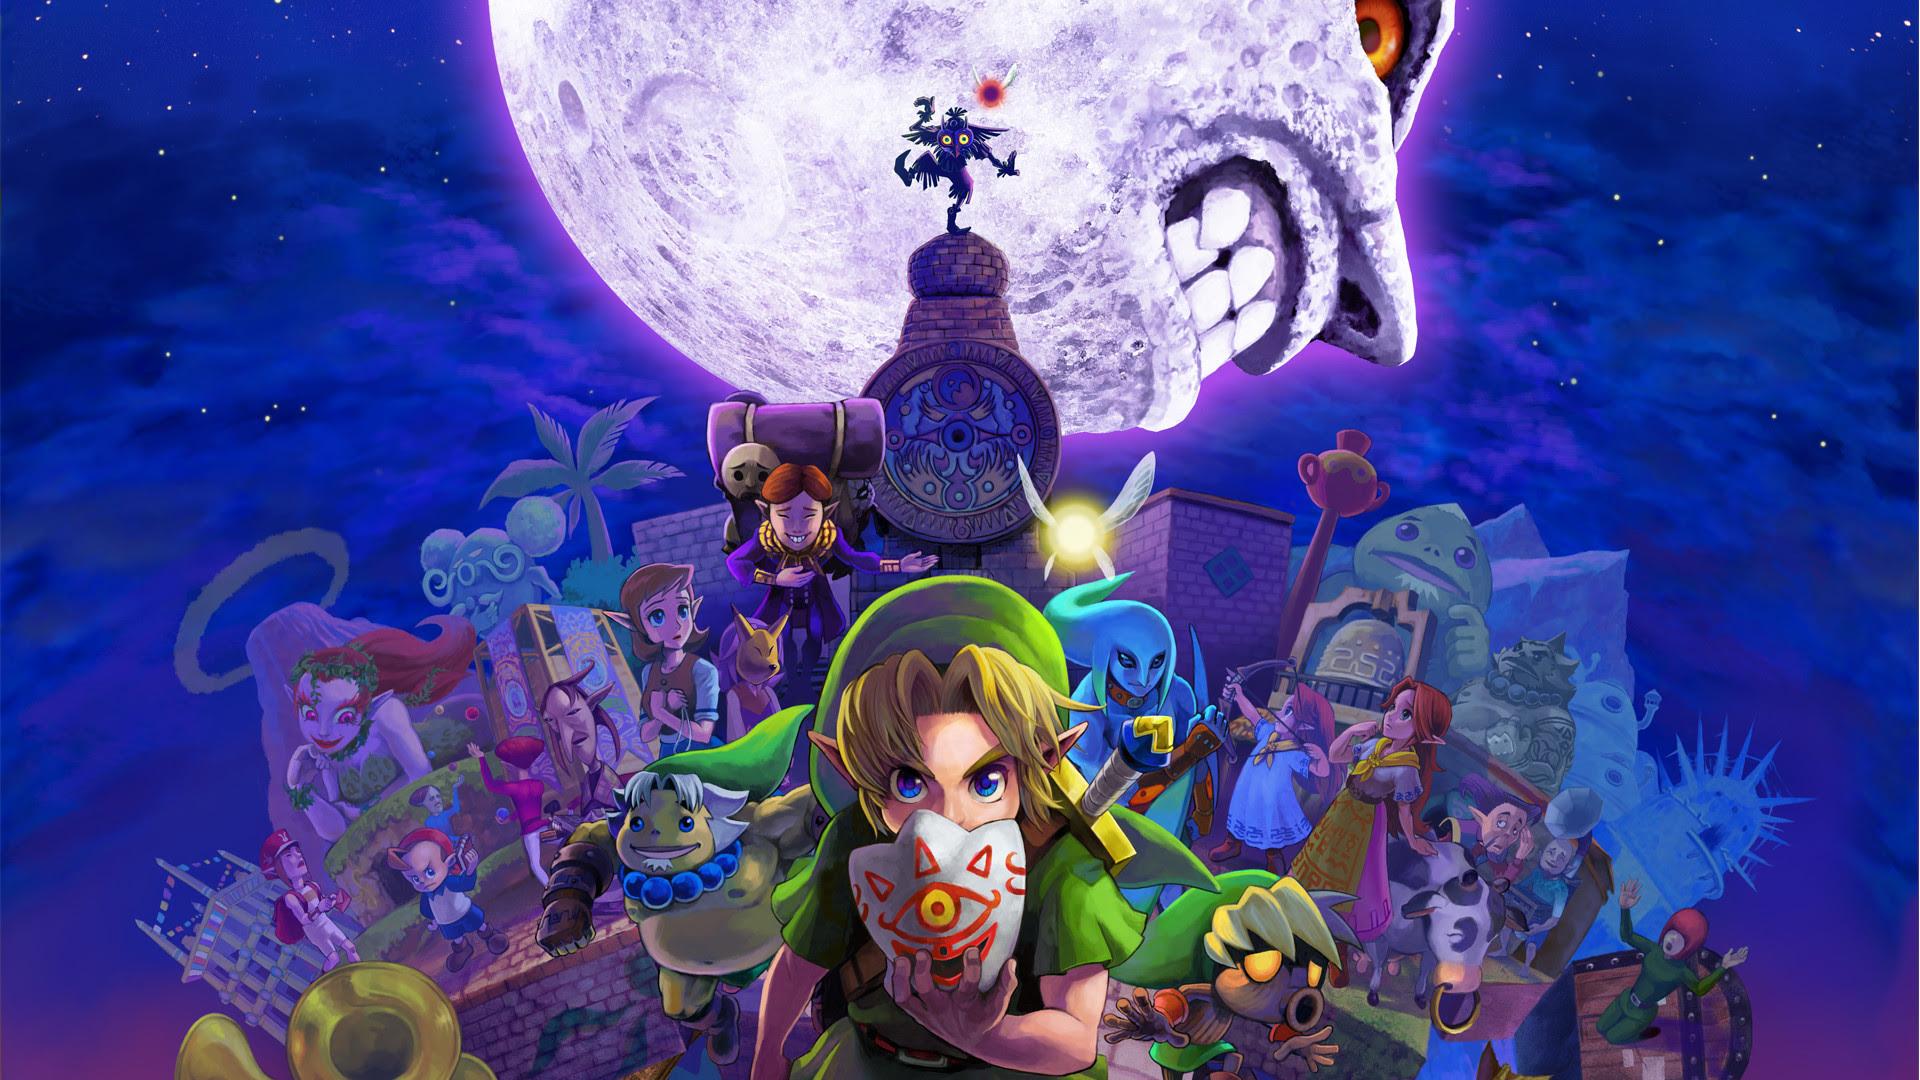 3d Legend Of Zelda Wallpaper 67 Images